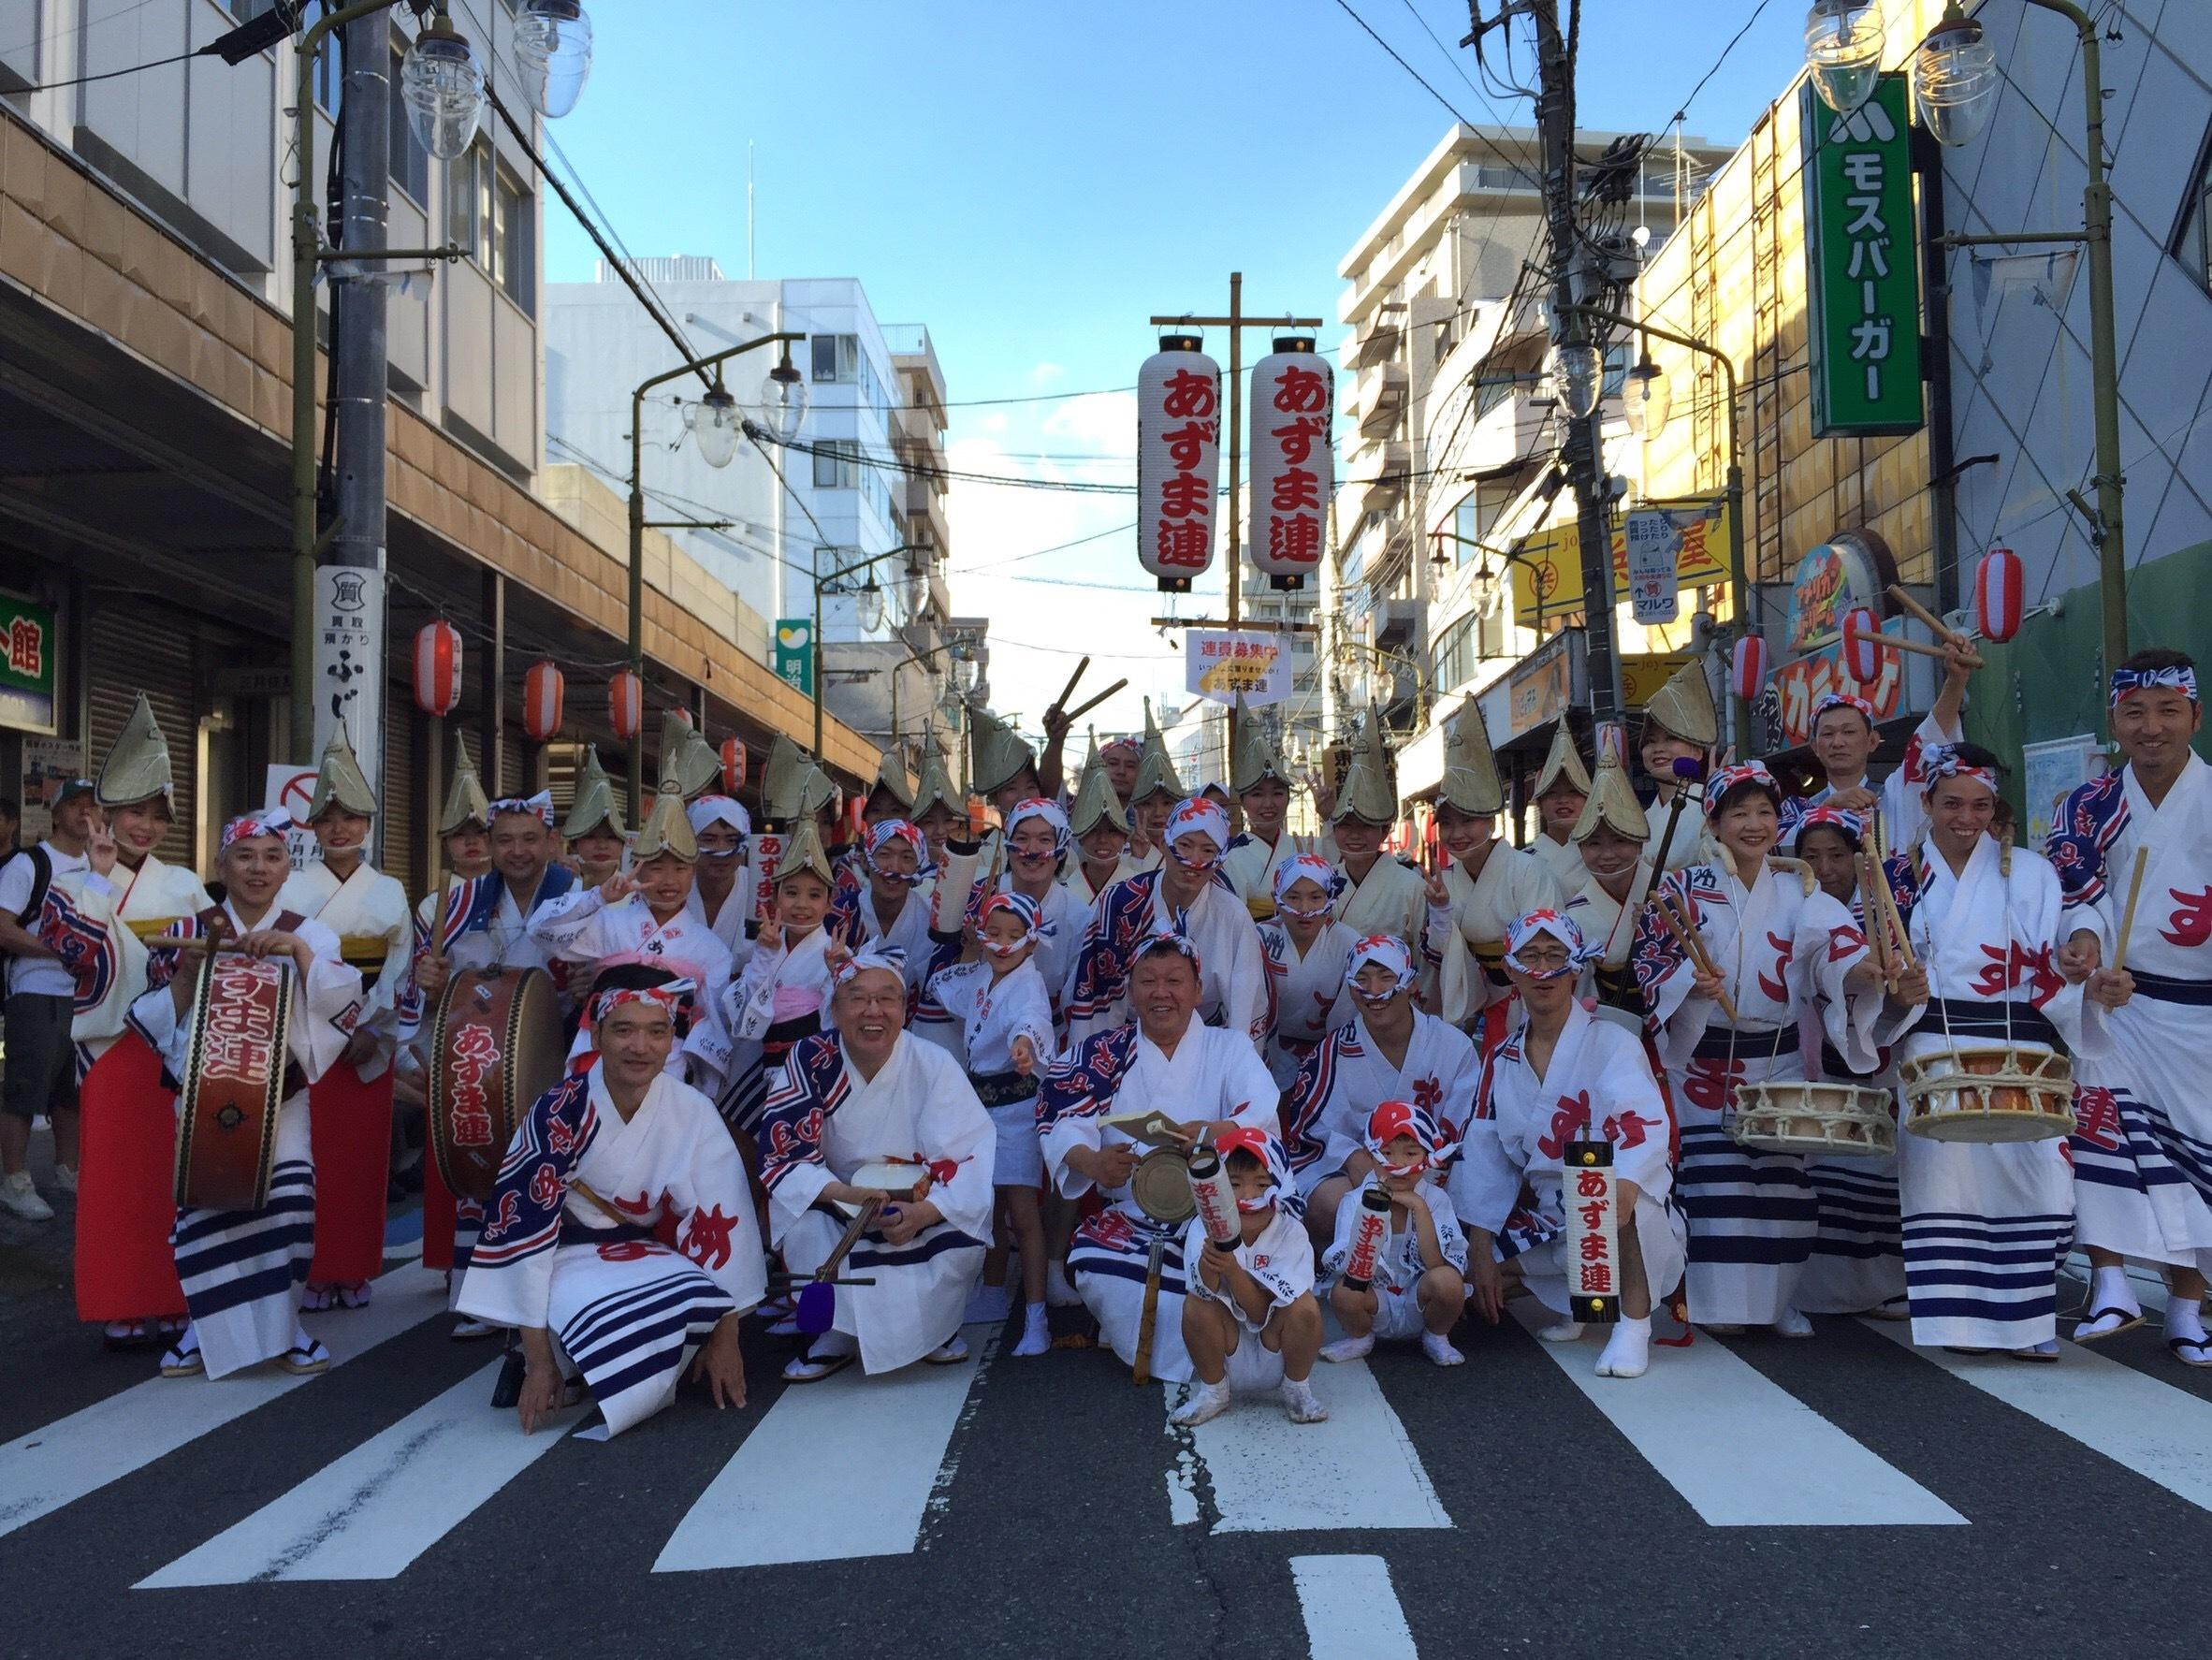 第40回神奈川大和阿波踊り